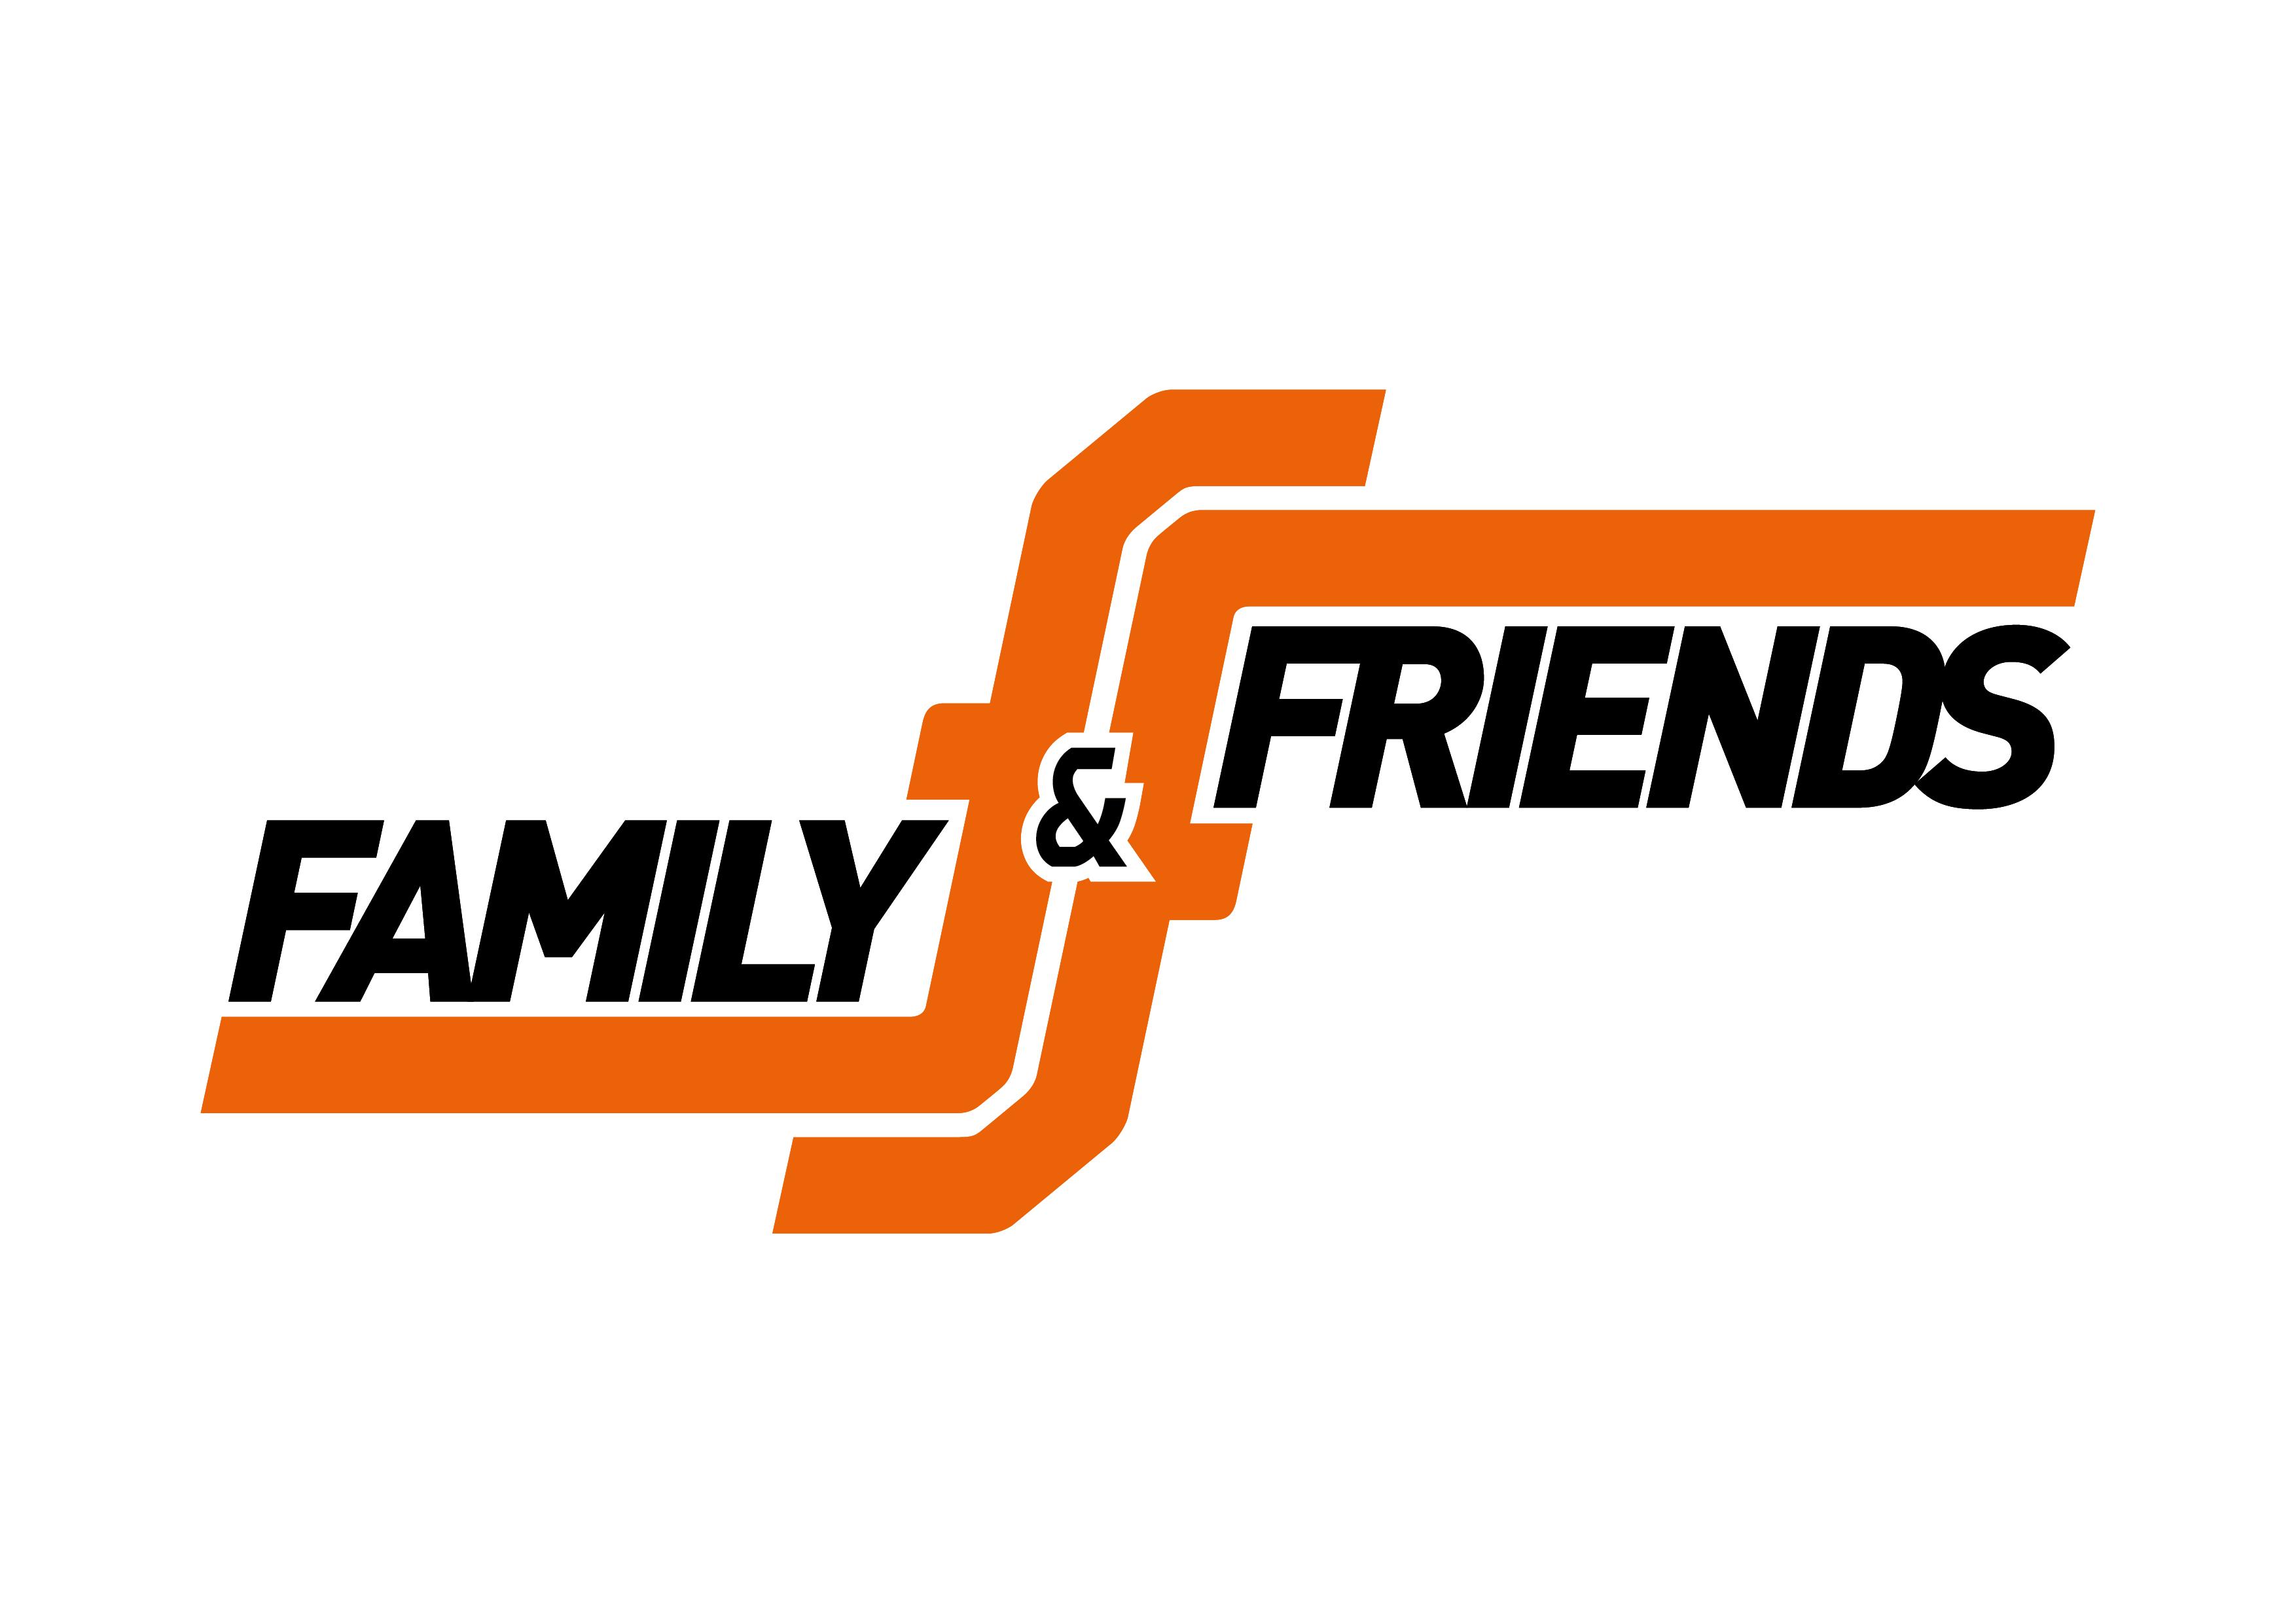 Family & Friends KTM